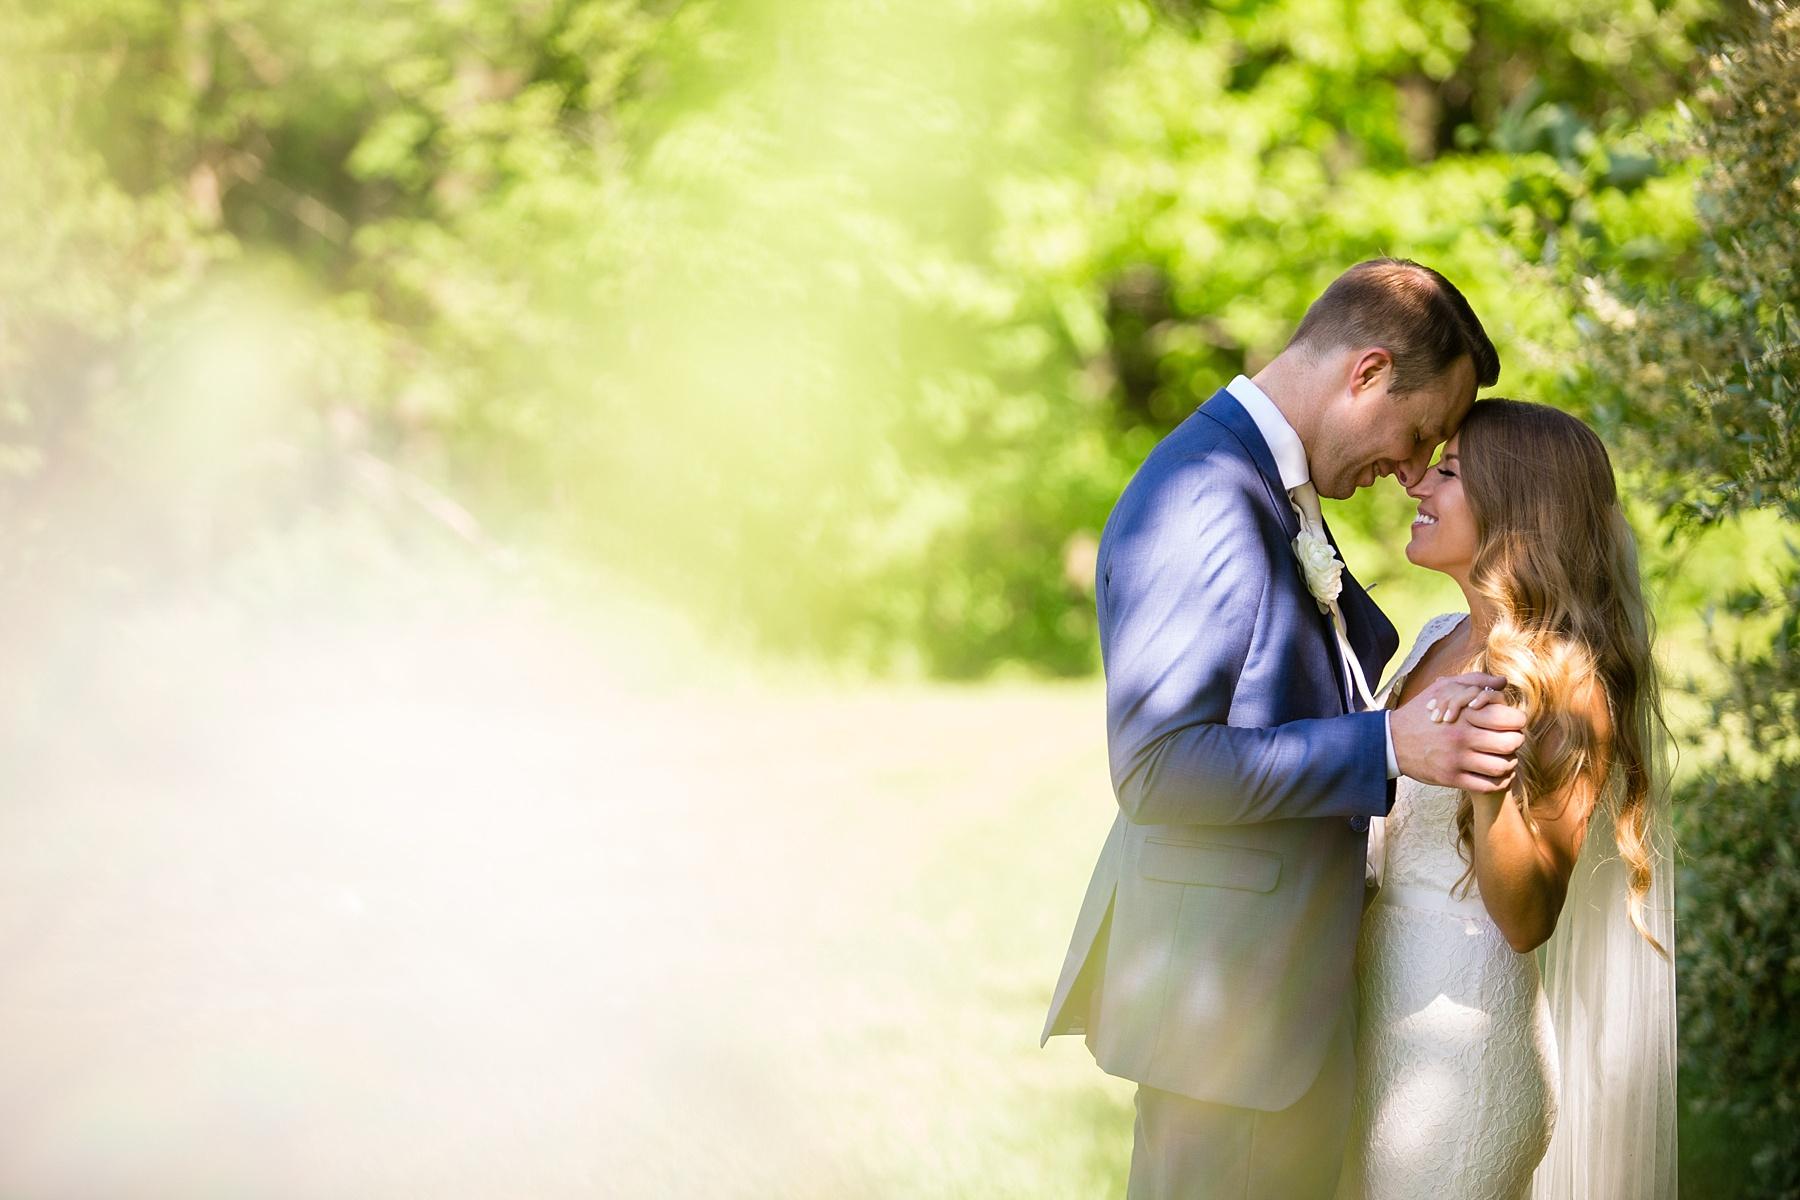 Brandon_Shafer_Photography_Kara_Doug_12_corners_Wedding_Benton_Harbor_0050.jpg